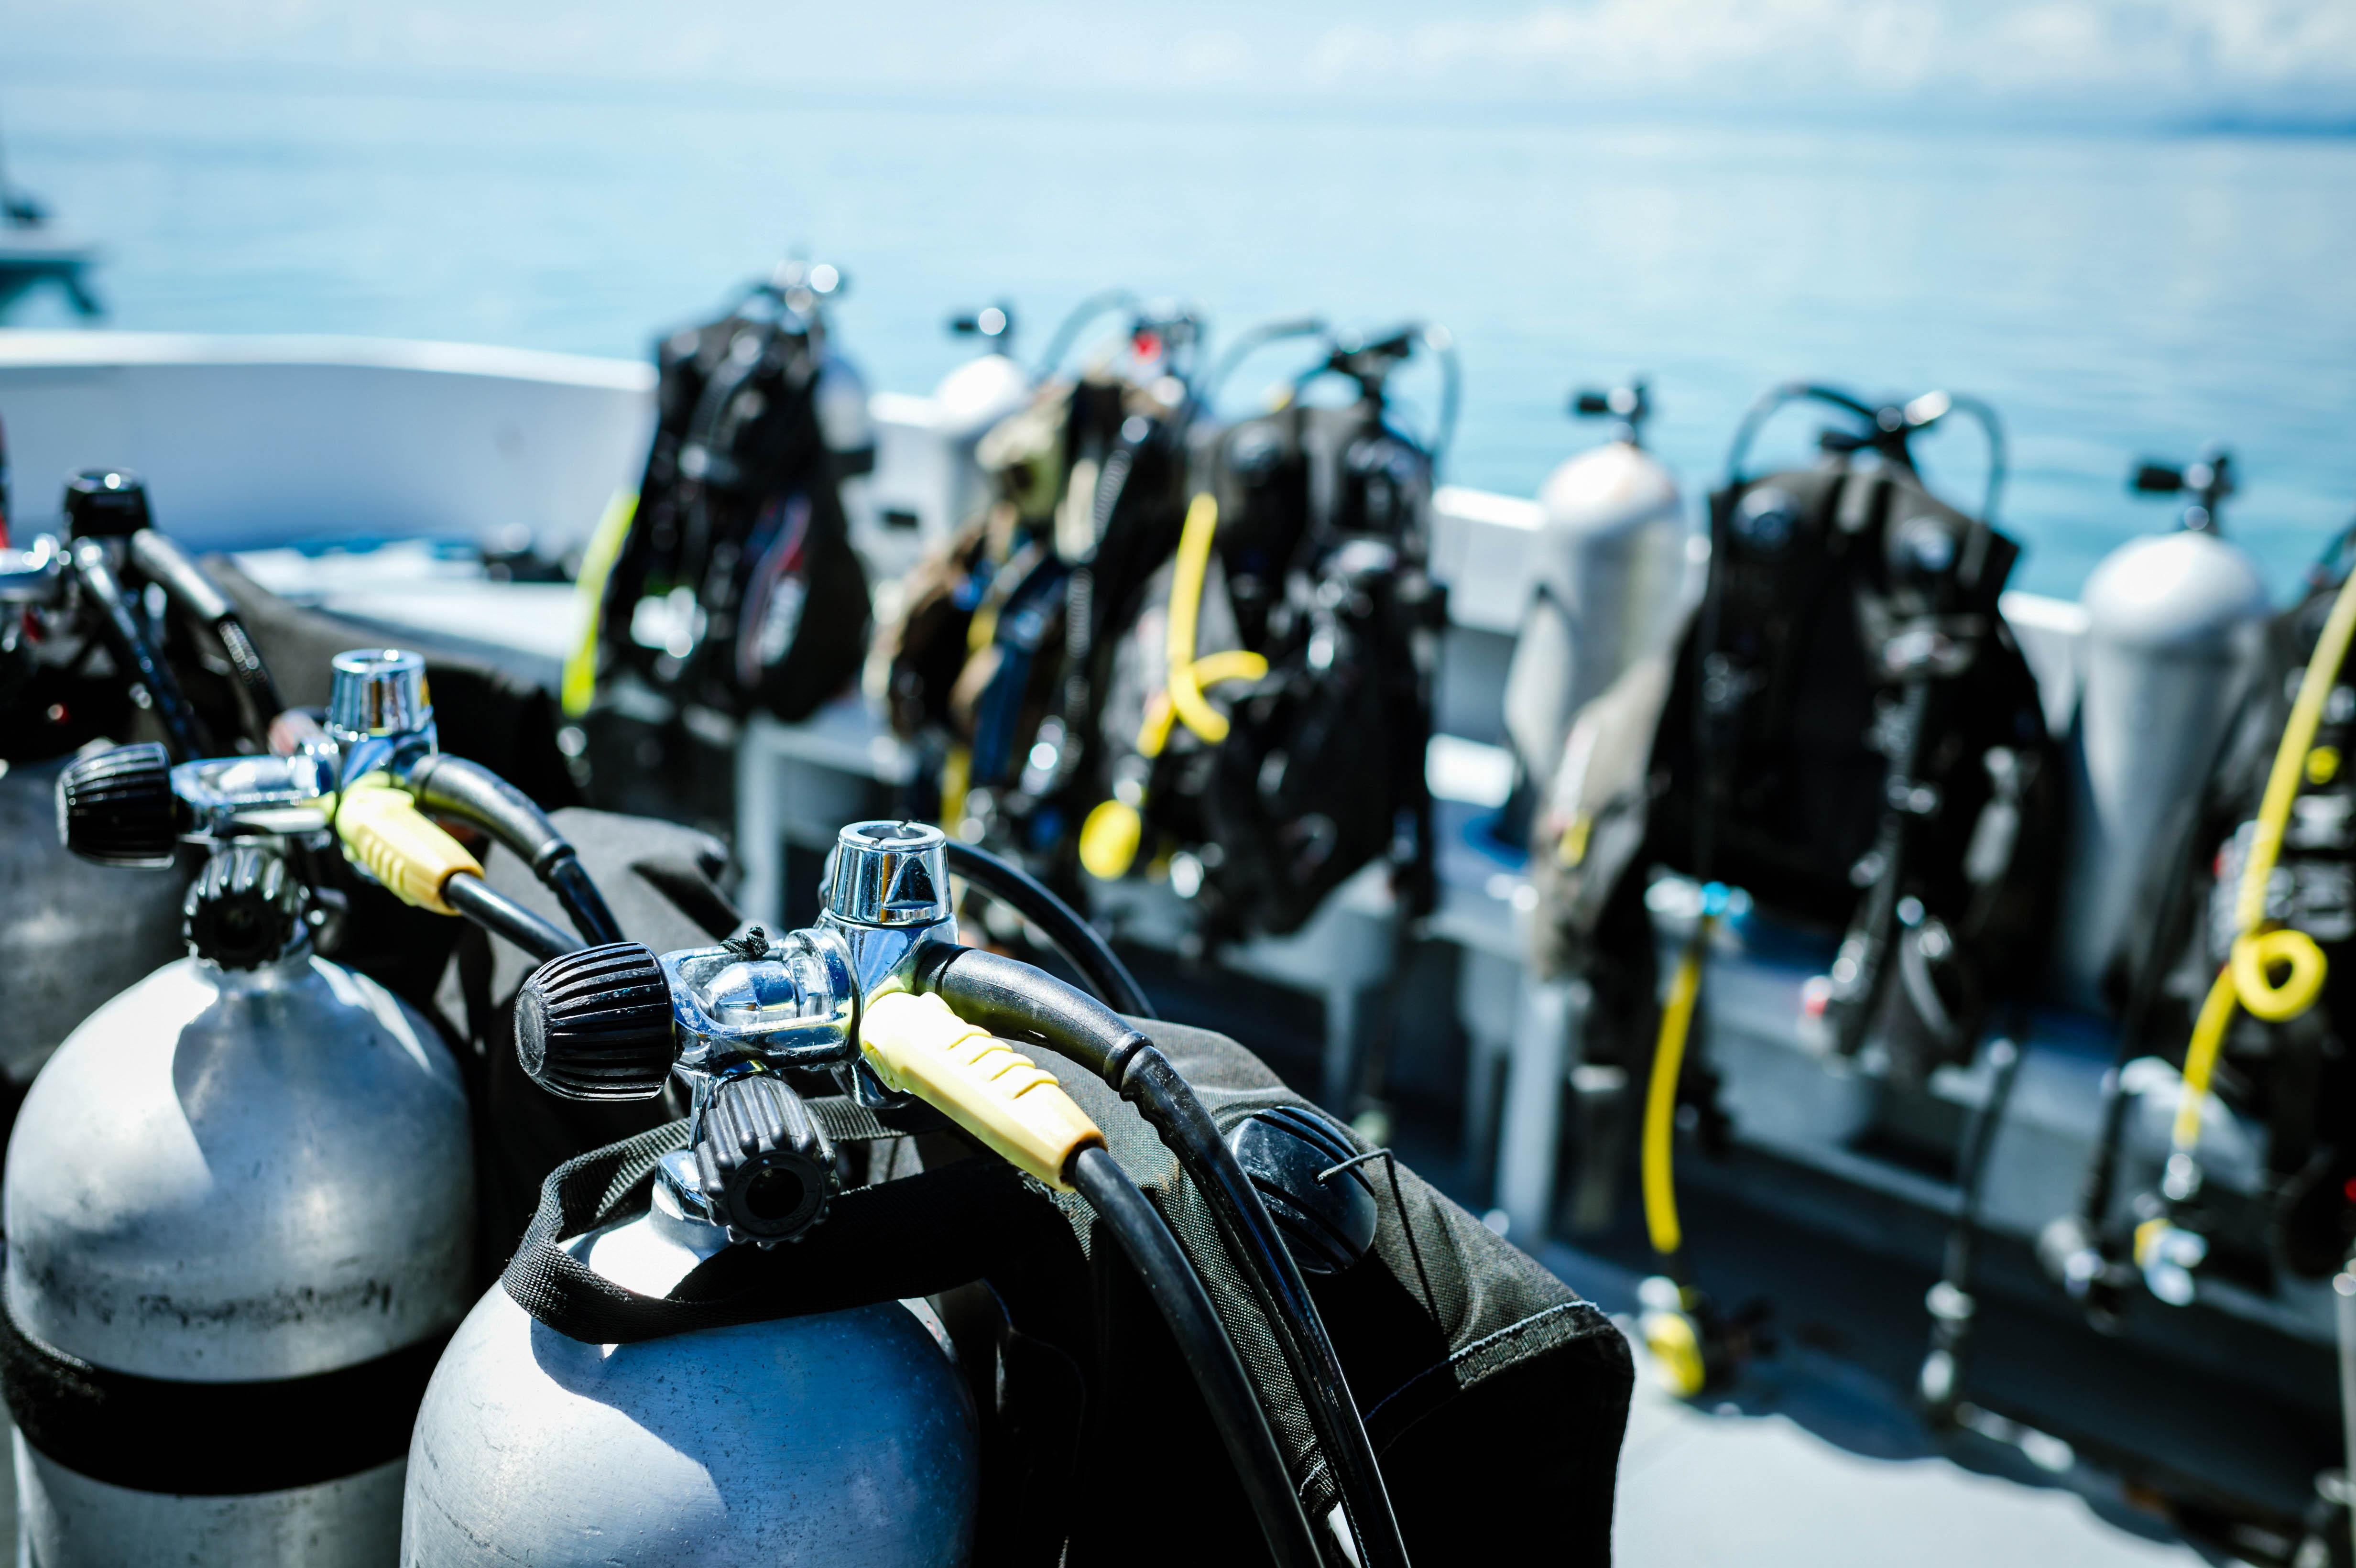 Tauchausrüstung Scuba Tauchen Diving